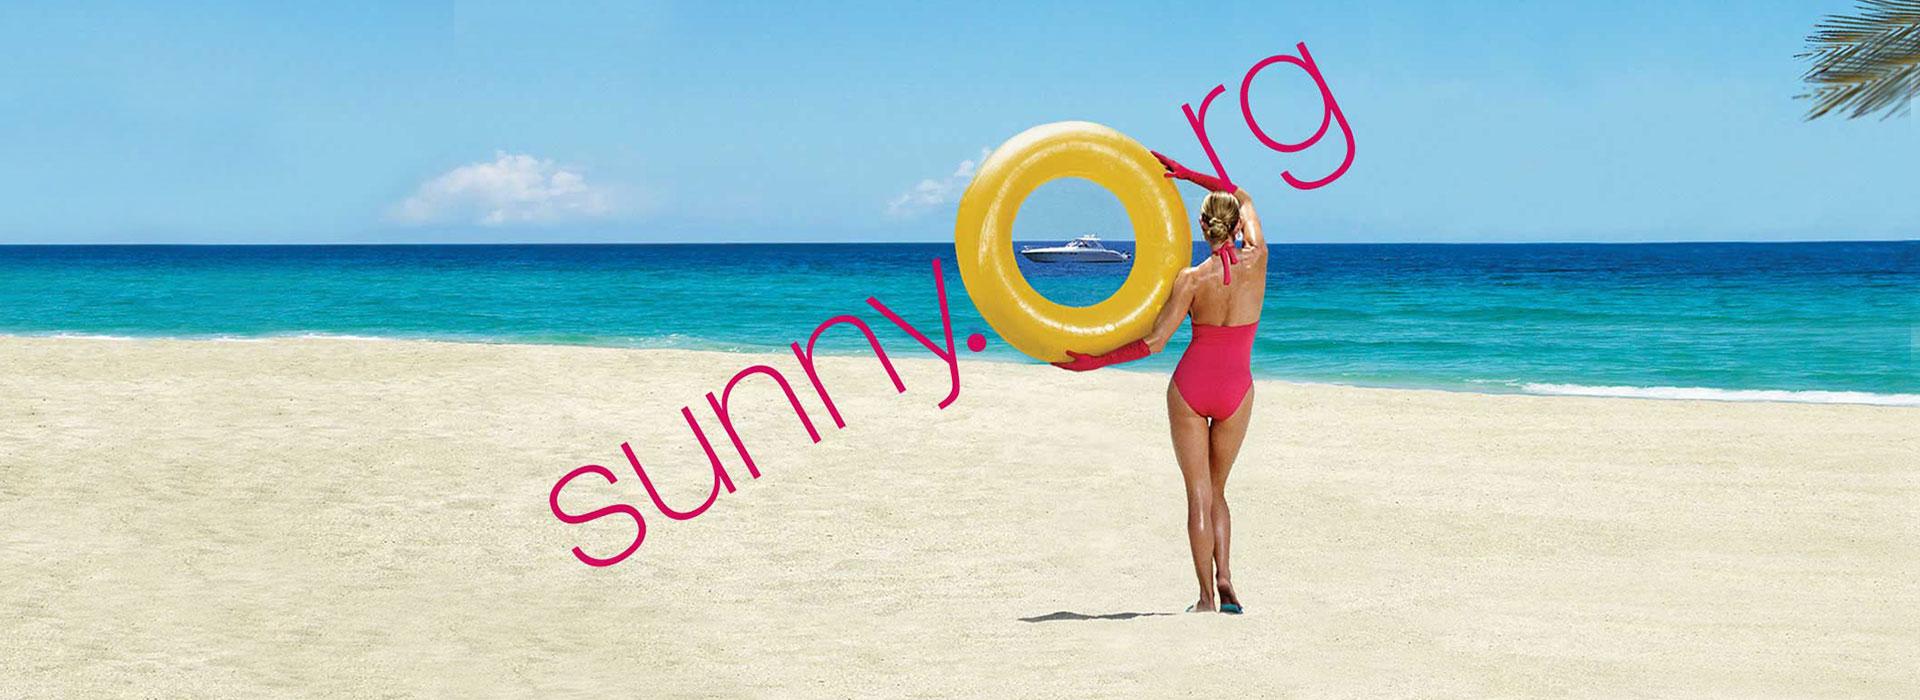 sunny-org_hero-2